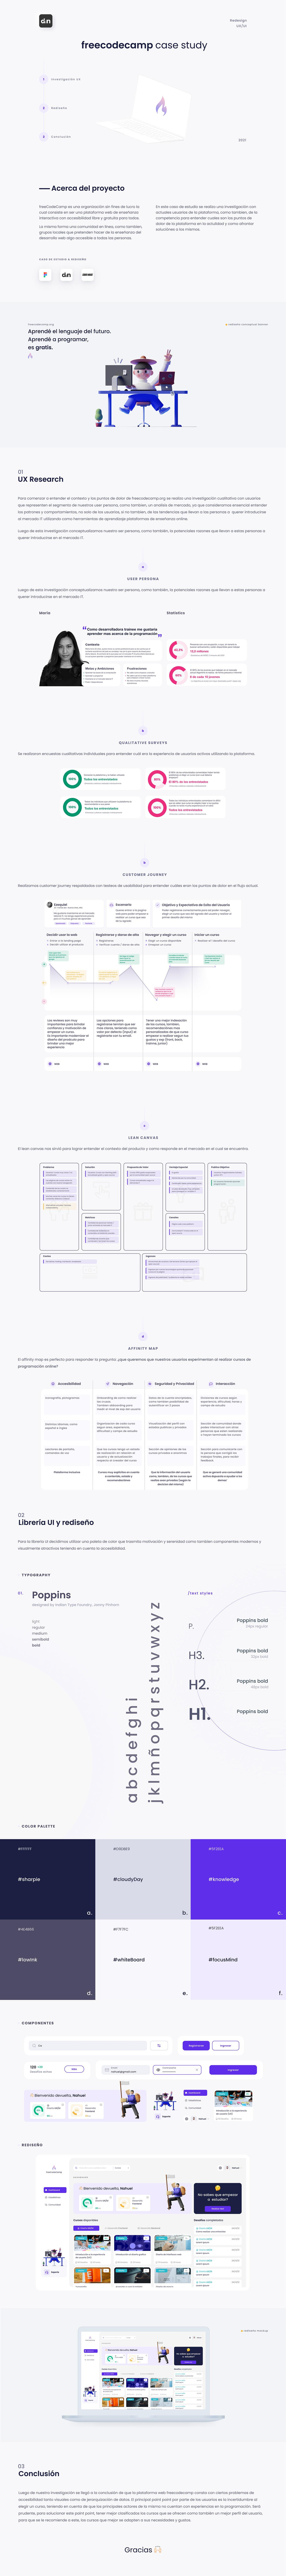 coderhouse freecodecamp product design  redesing UI ux visual design